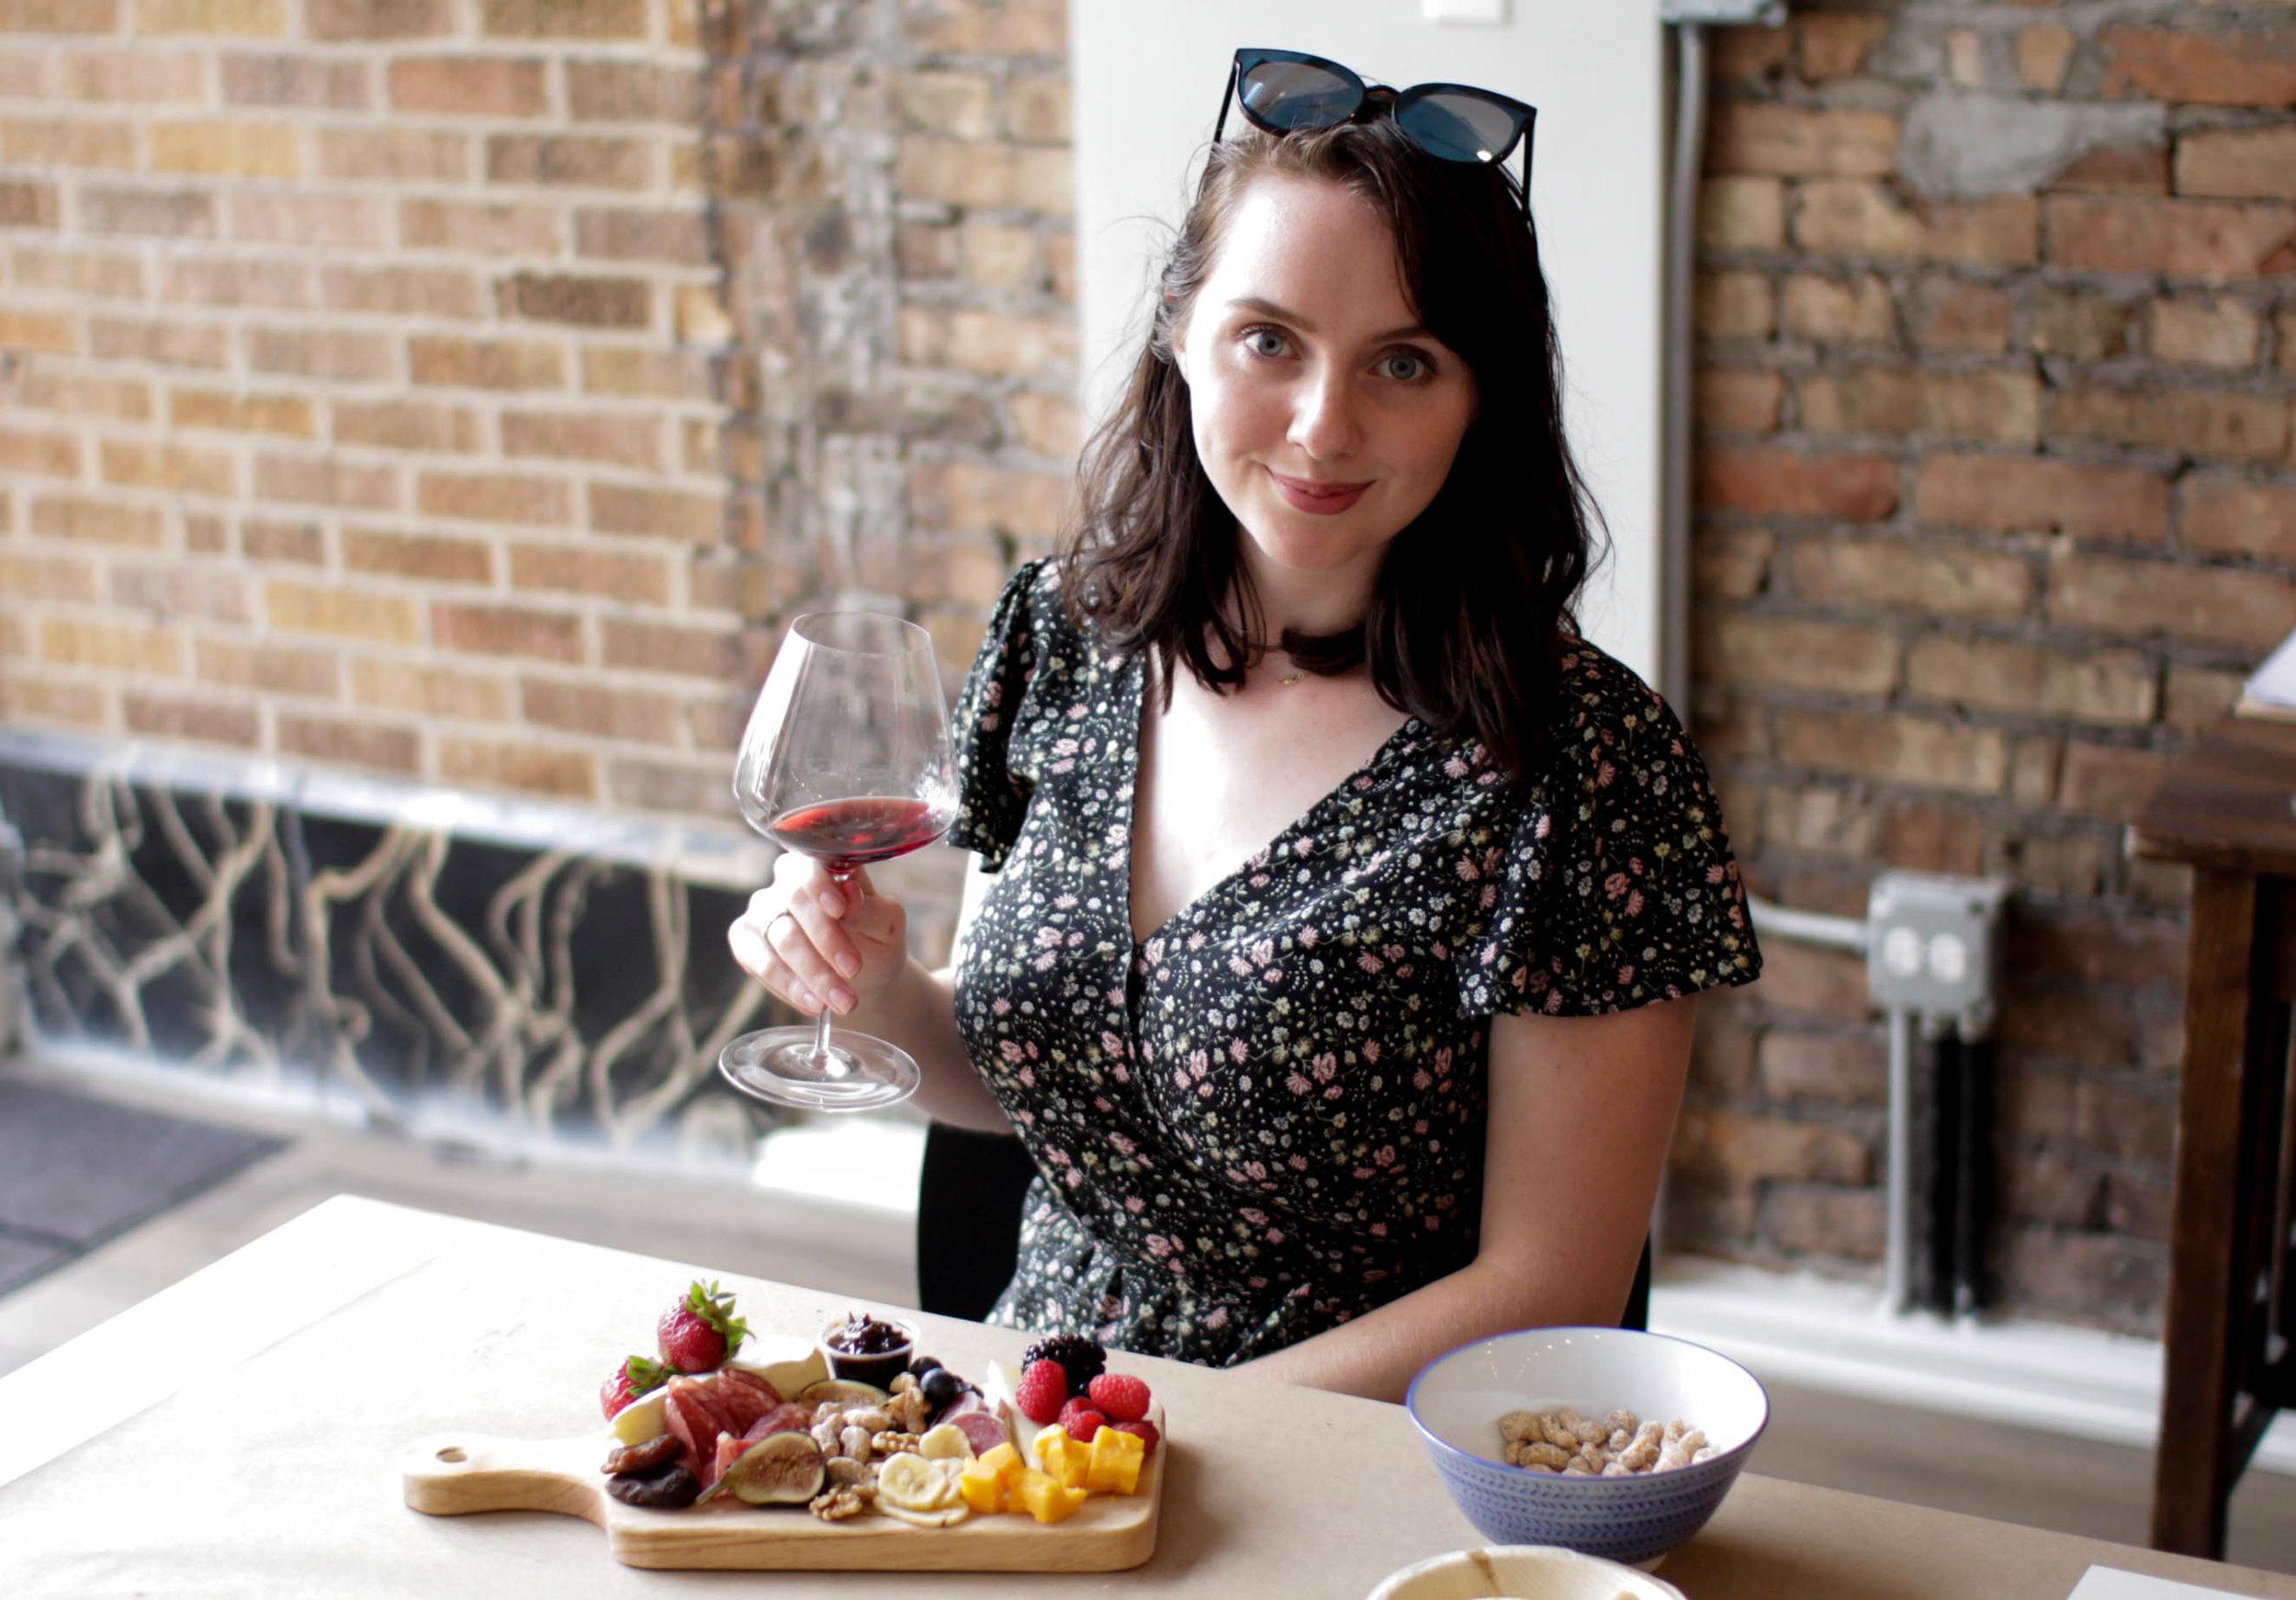 Grassl Glass and Ivy Grapes luxury Chicago stemware